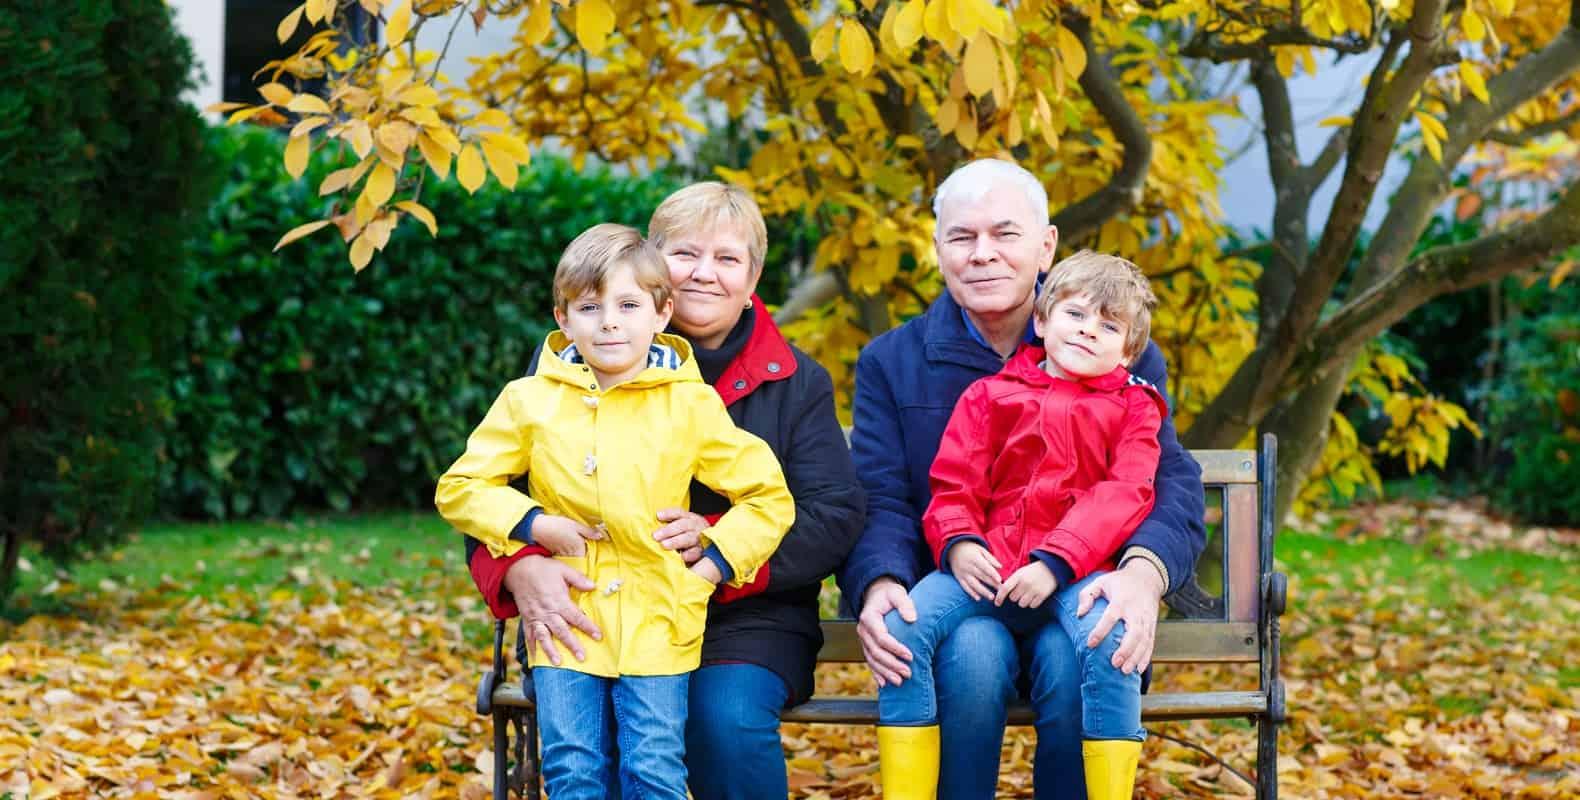 herstreis met kleinkinderen